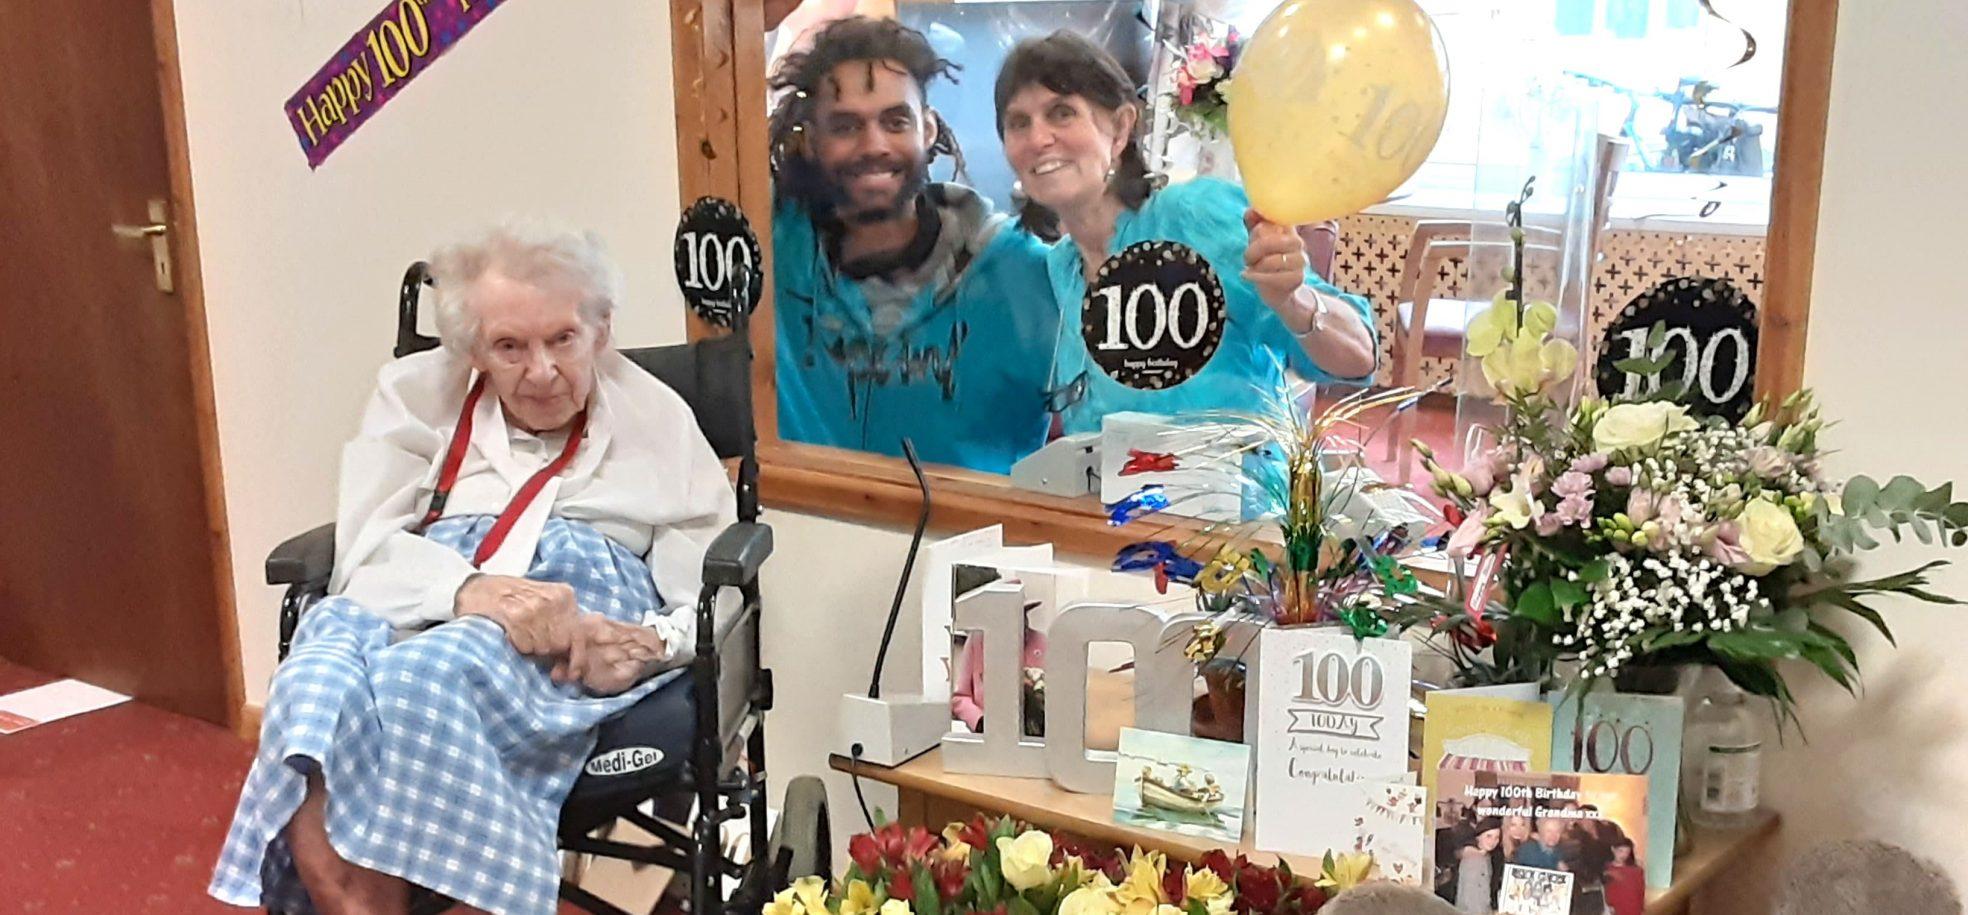 Margaret Bradley with her daughter Meriel and her grandson Jonathan